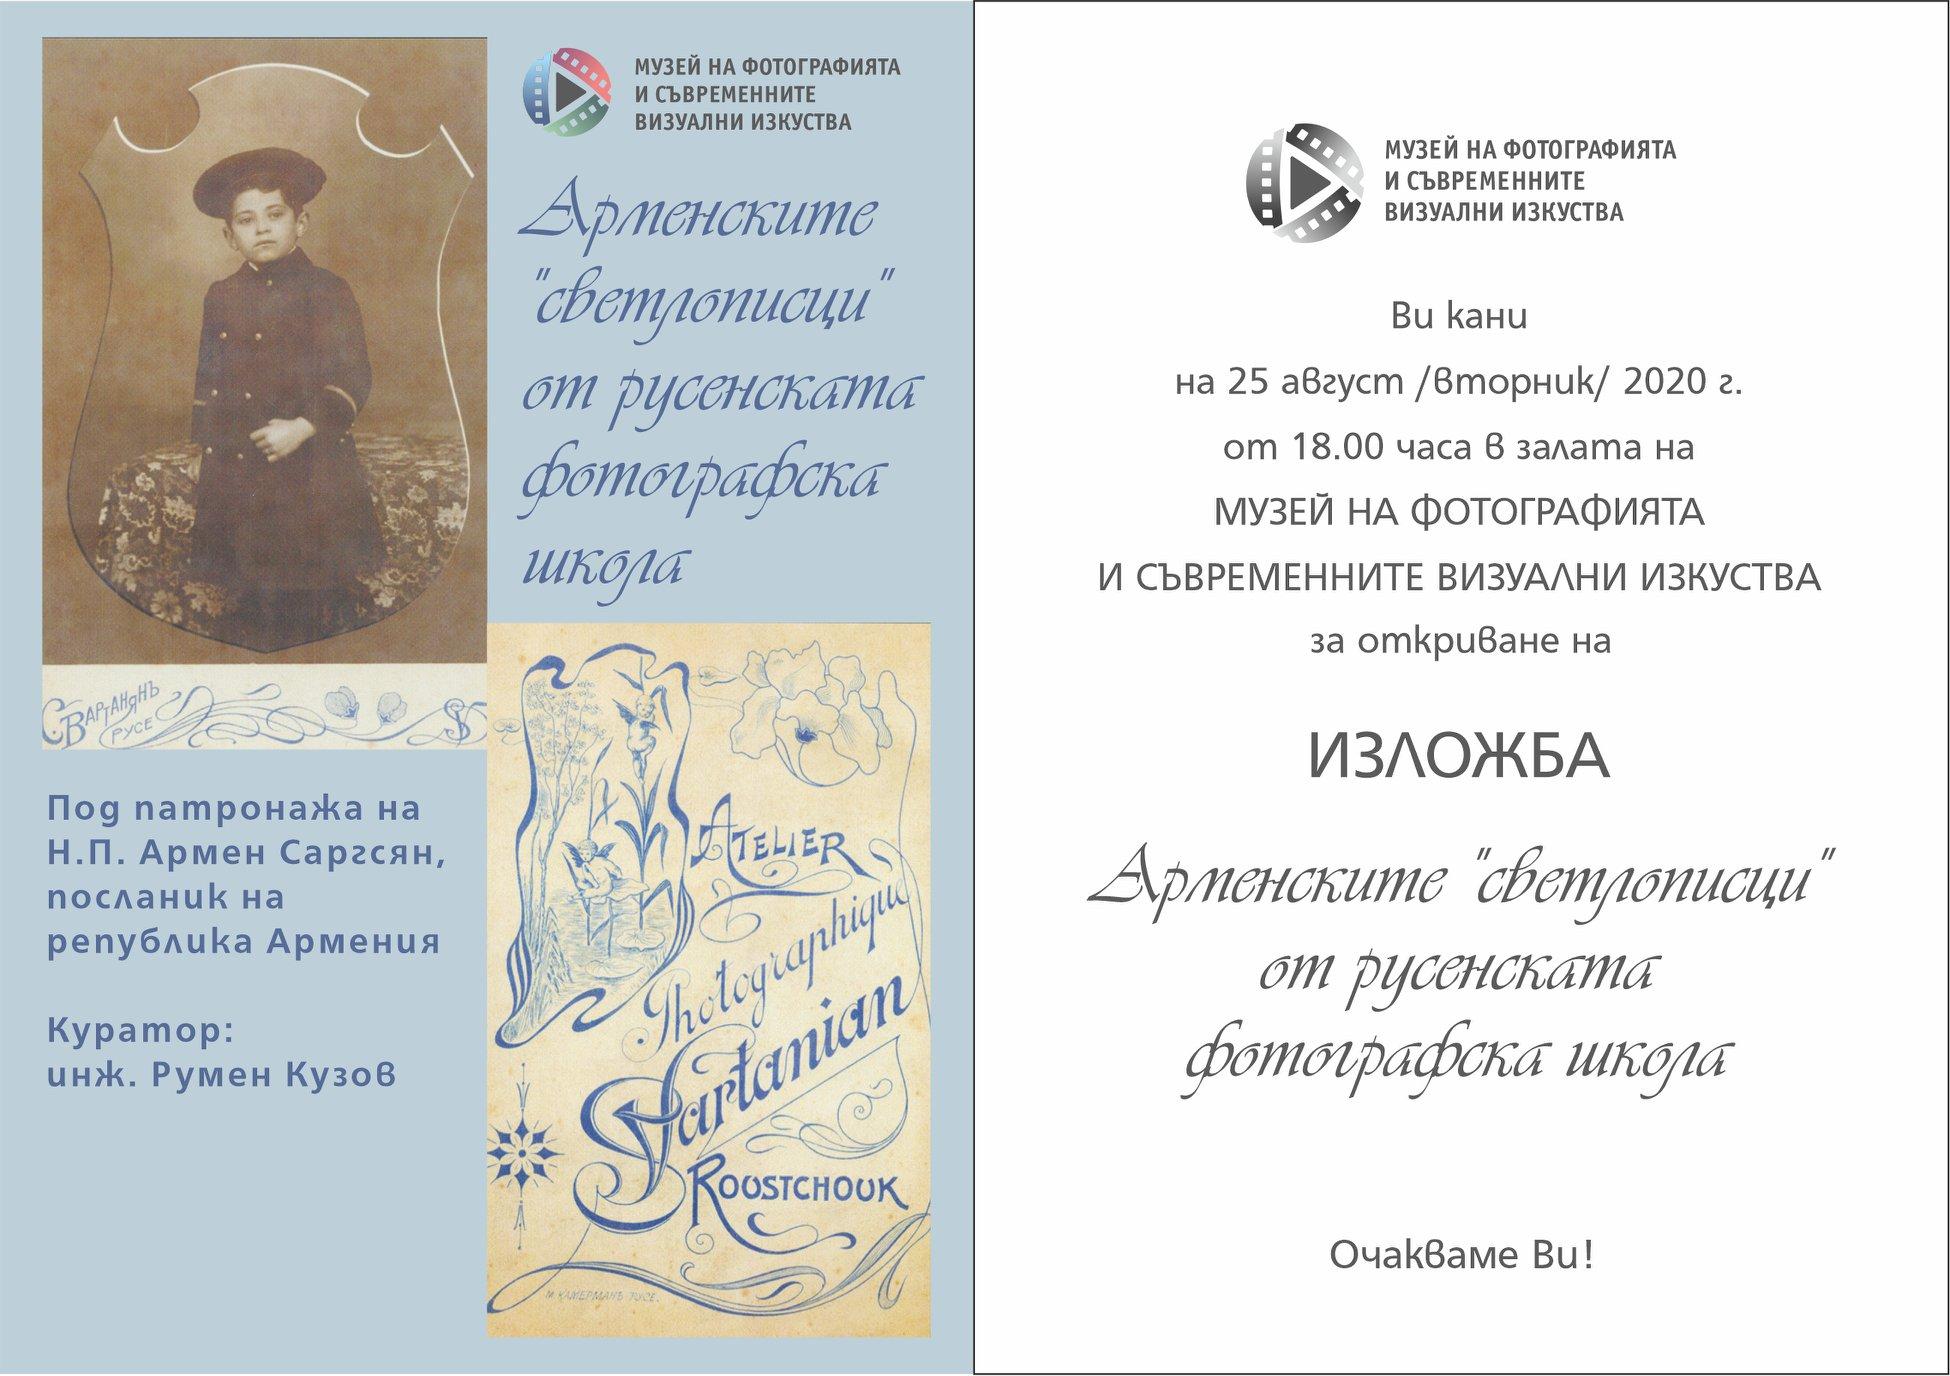 "Арменските ""светлописци"" от русенската фотографска школа"